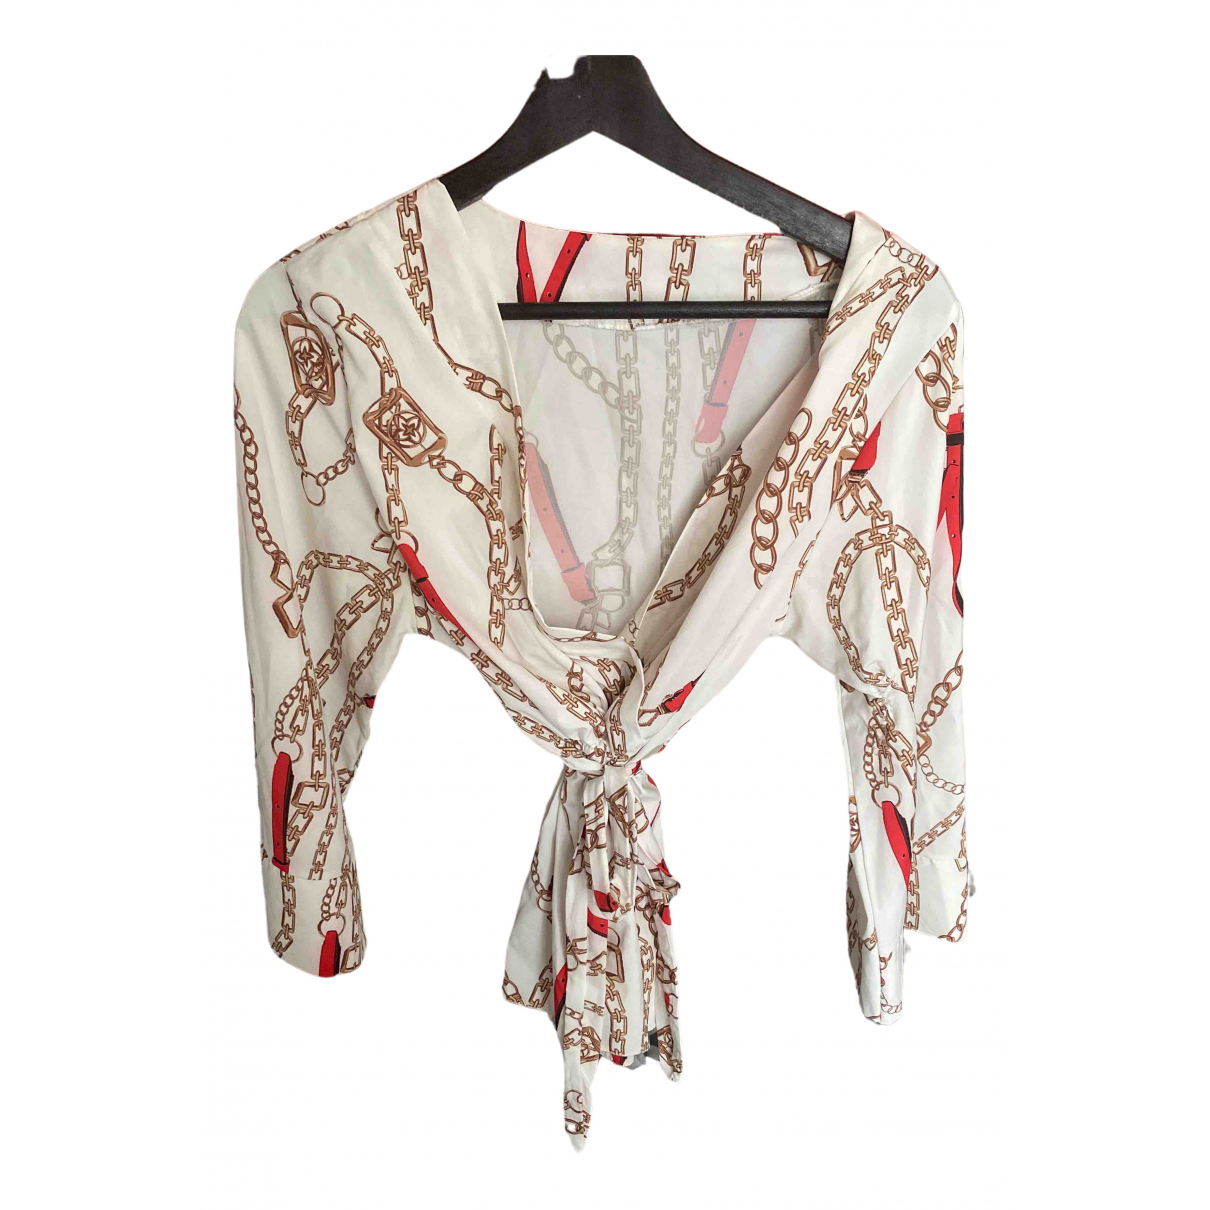 Zara \N White Cashmere  top for Women 40 FR